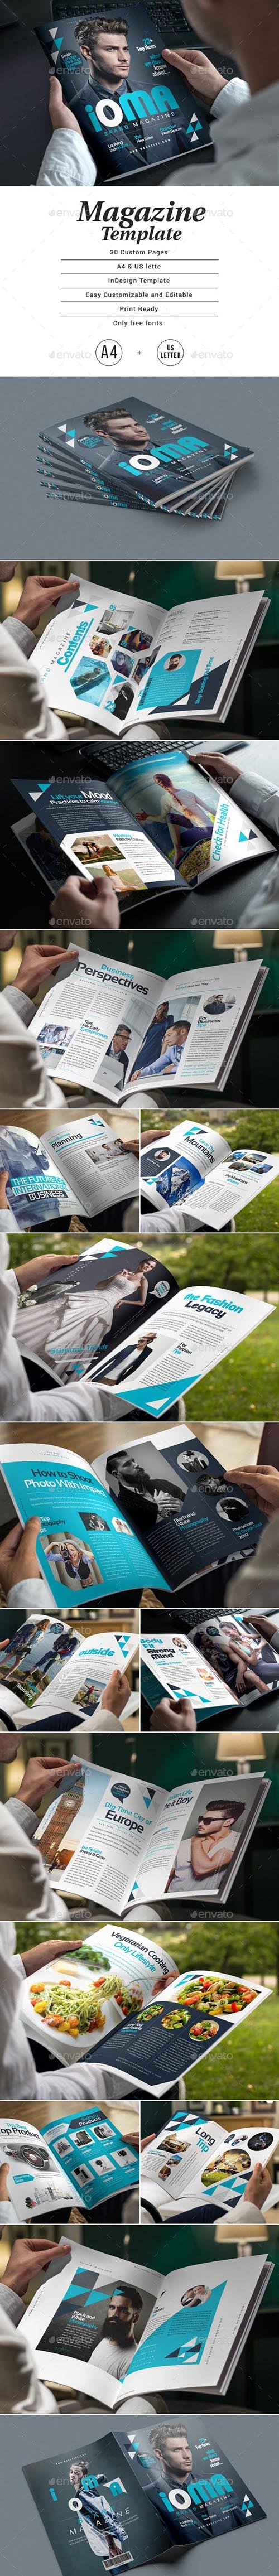 Magazine Template 23245199